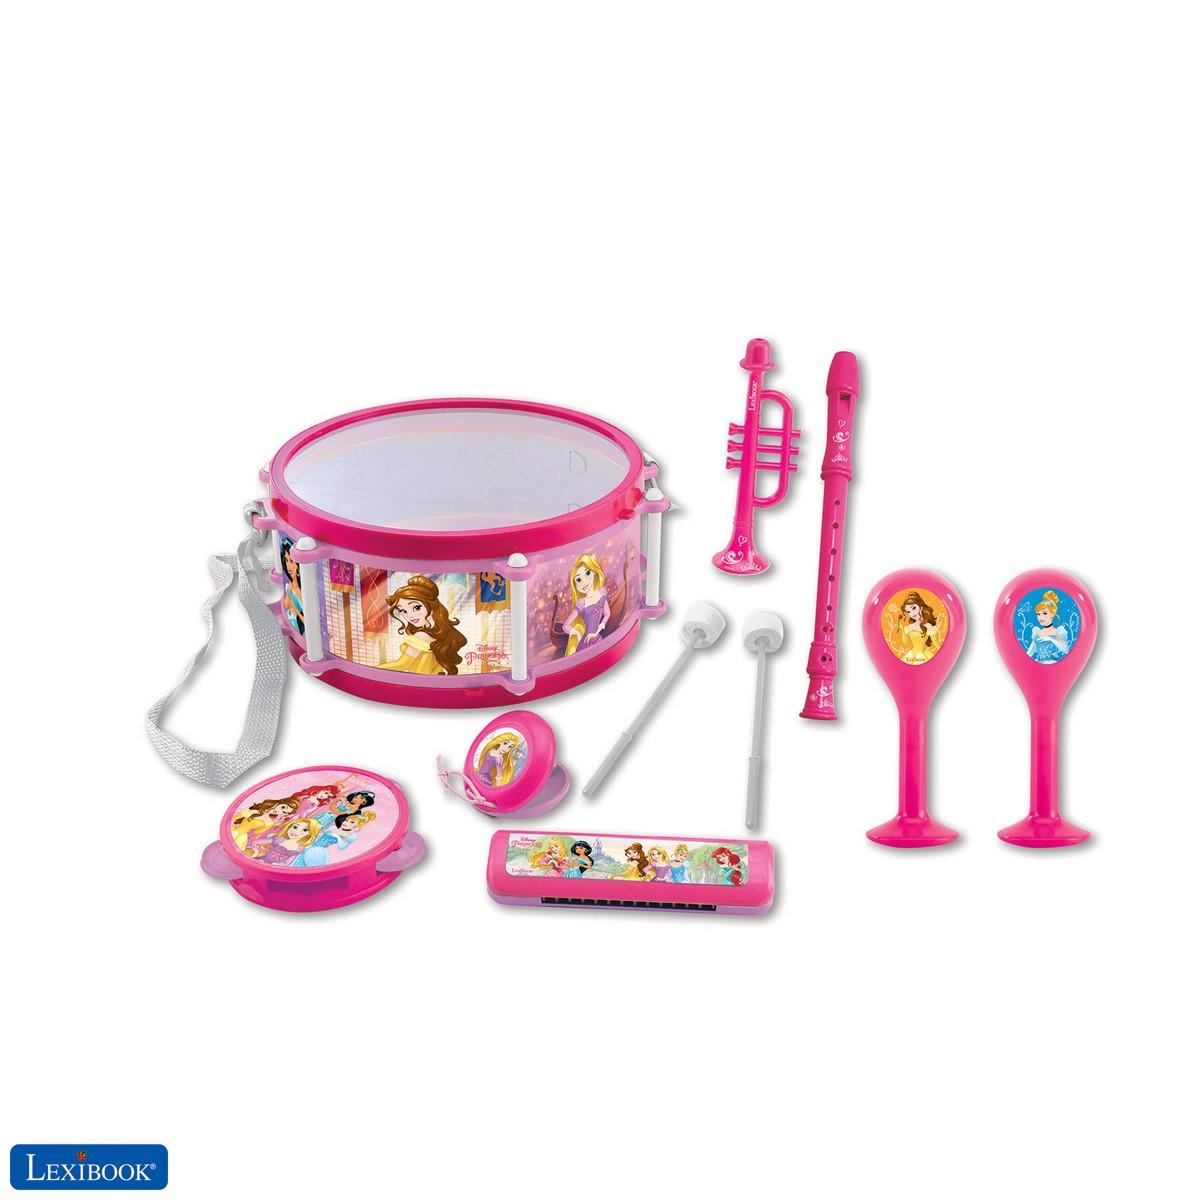 Disney Princess Cinderella Belle, Musical Toy